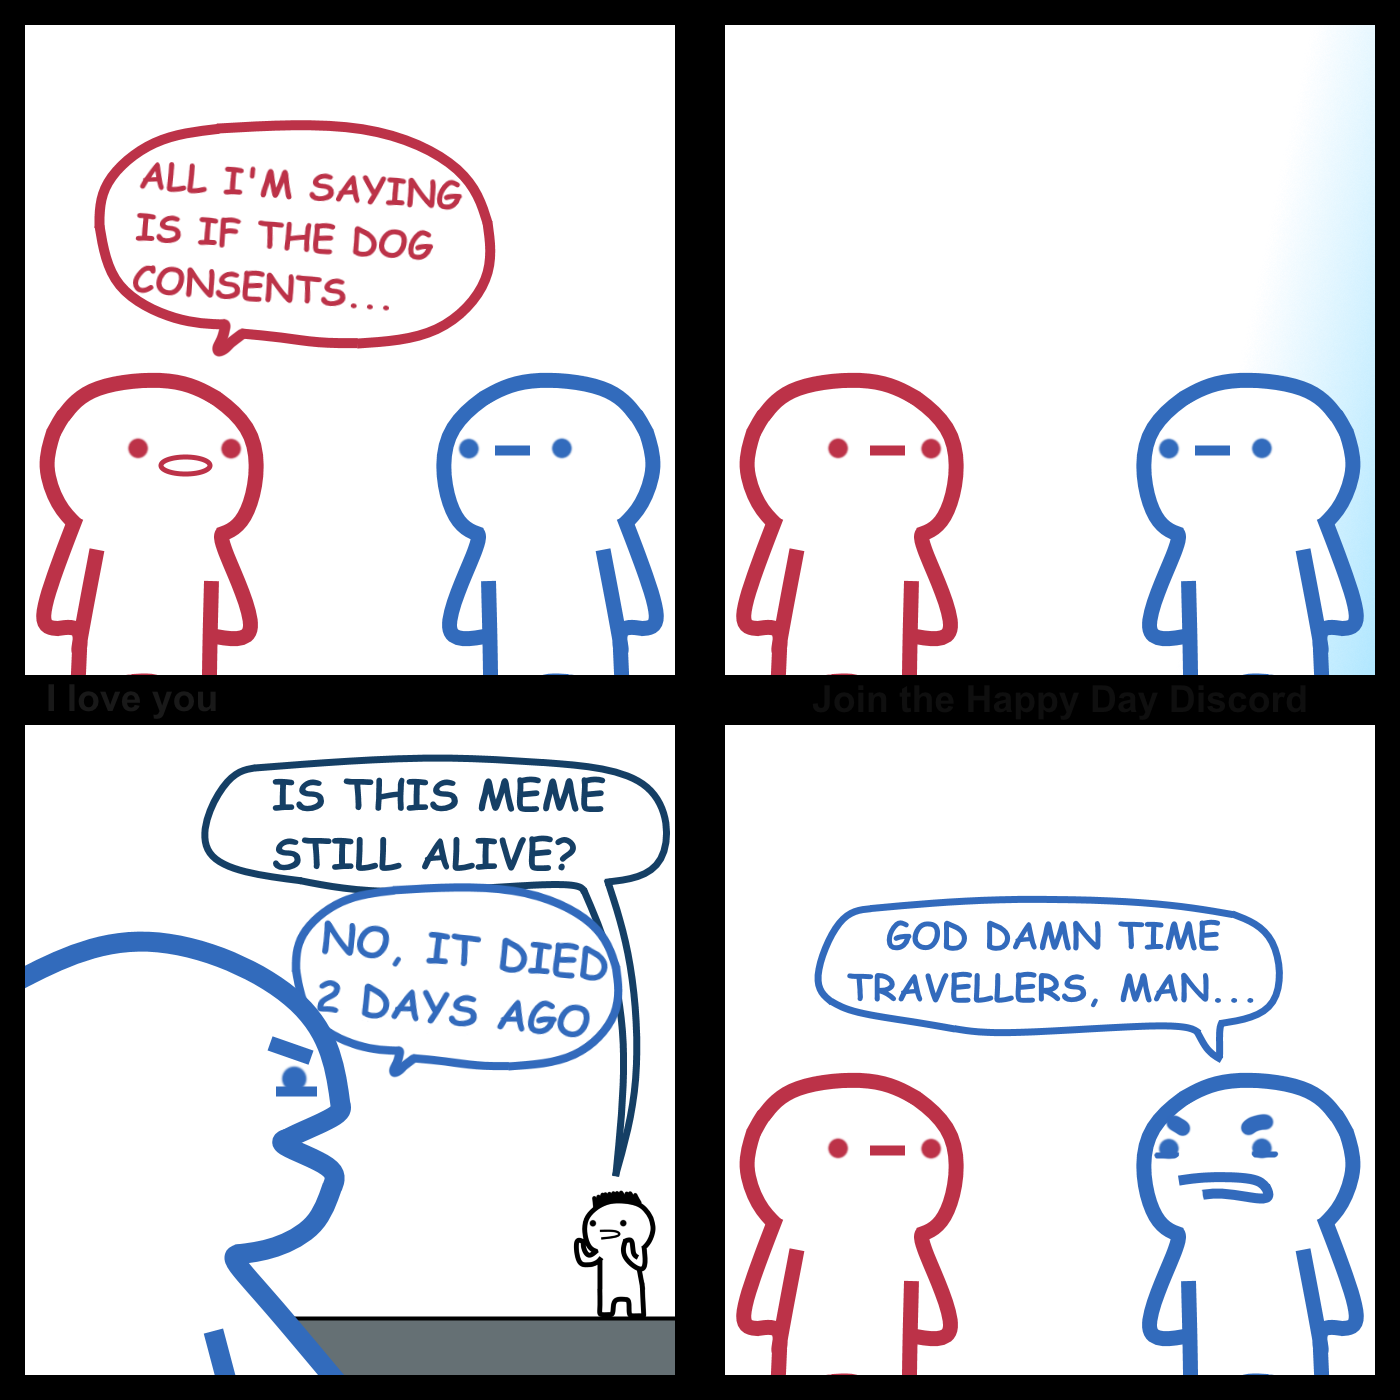 611637